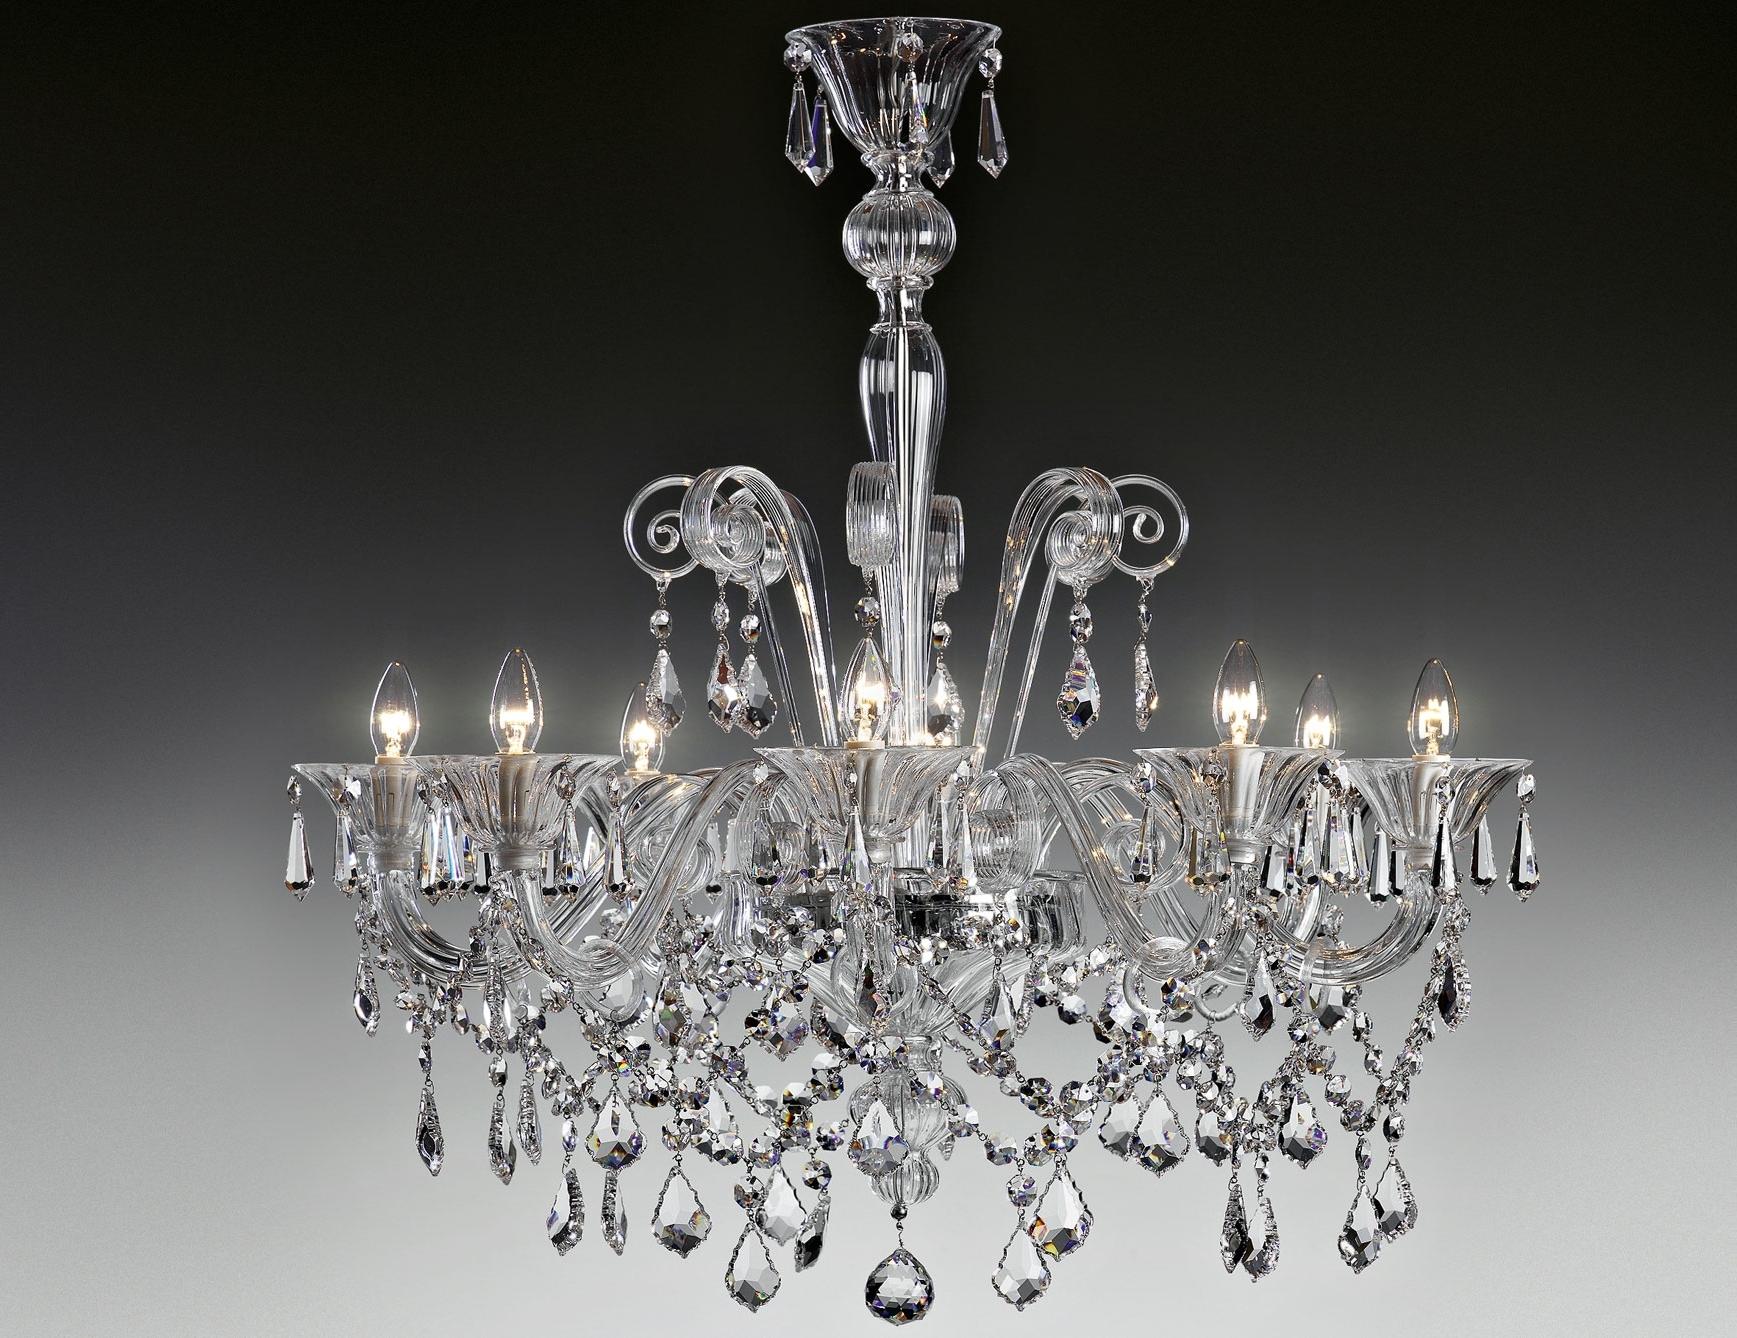 Most Recently Released Nella Vetrina Lulu 9016 8 Modern Italian Chandelier Clear Murano Glass With Modern Italian Chandeliers (View 8 of 15)